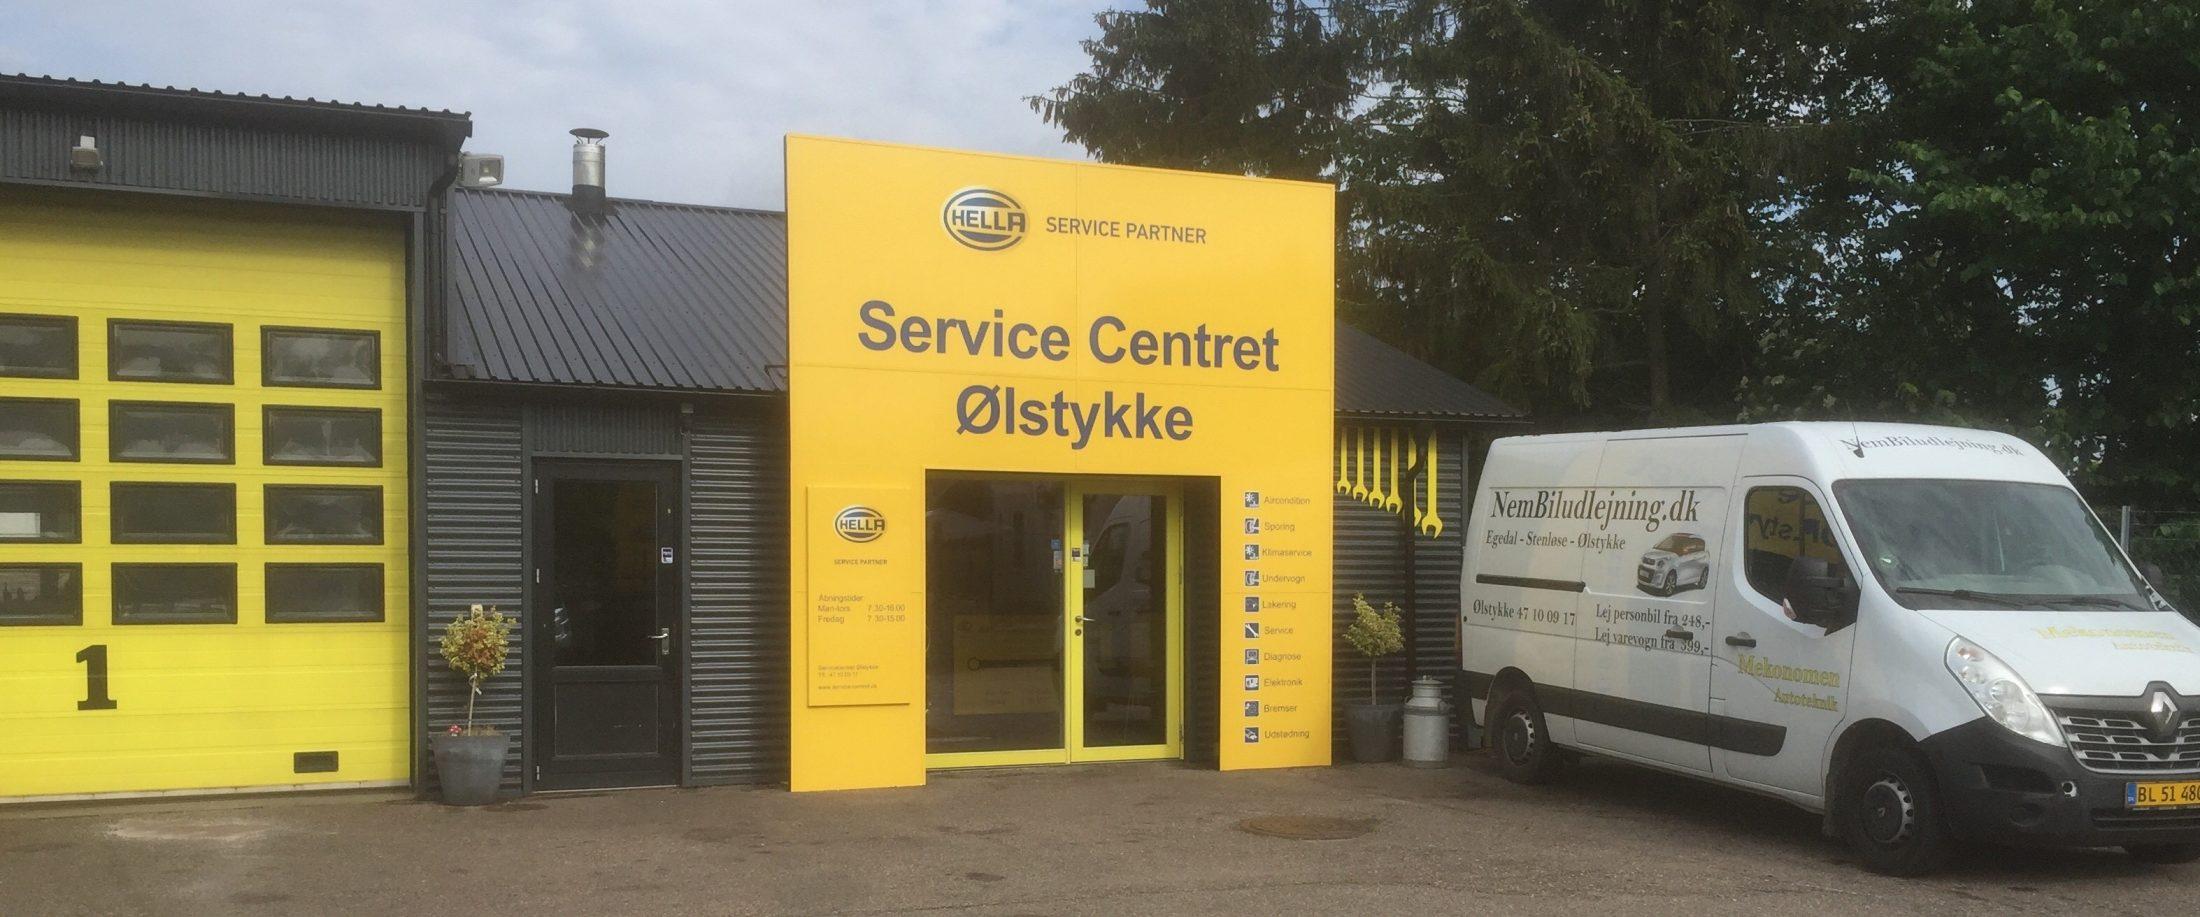 Service Centret – Hella Service Partner i Ølstykke